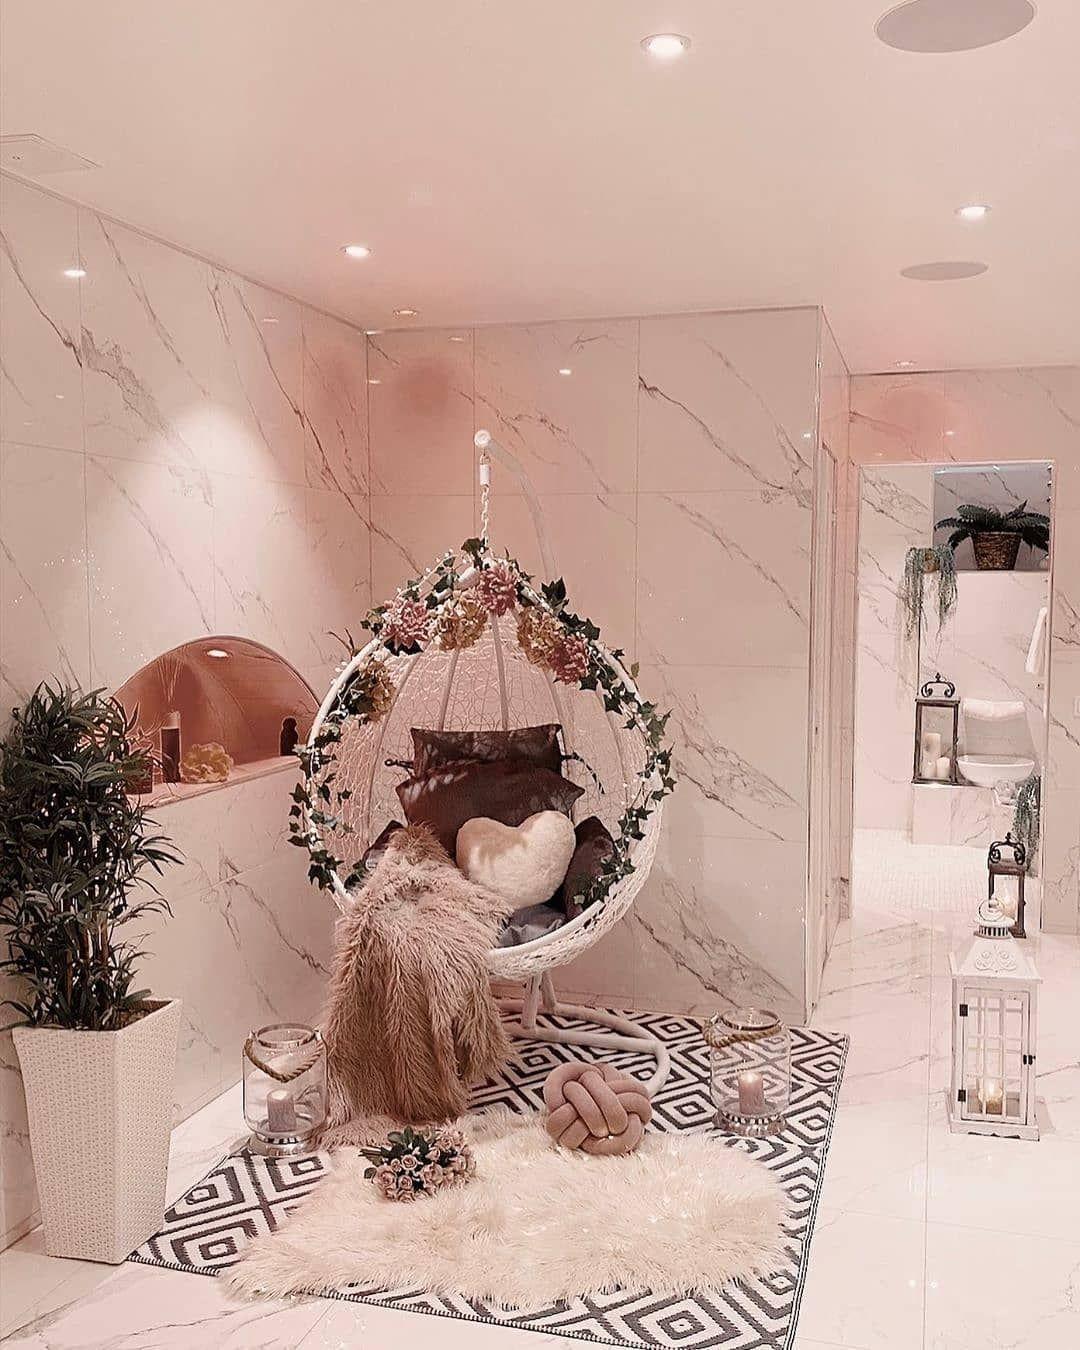 ديكور On Instagram رايكم برعاية Qasr Alkhazayin2 غرف نوم جاهز تفصيل حسب الطلب غرف ن Diy Apartment Decor Living Room Design Modern Home Decor